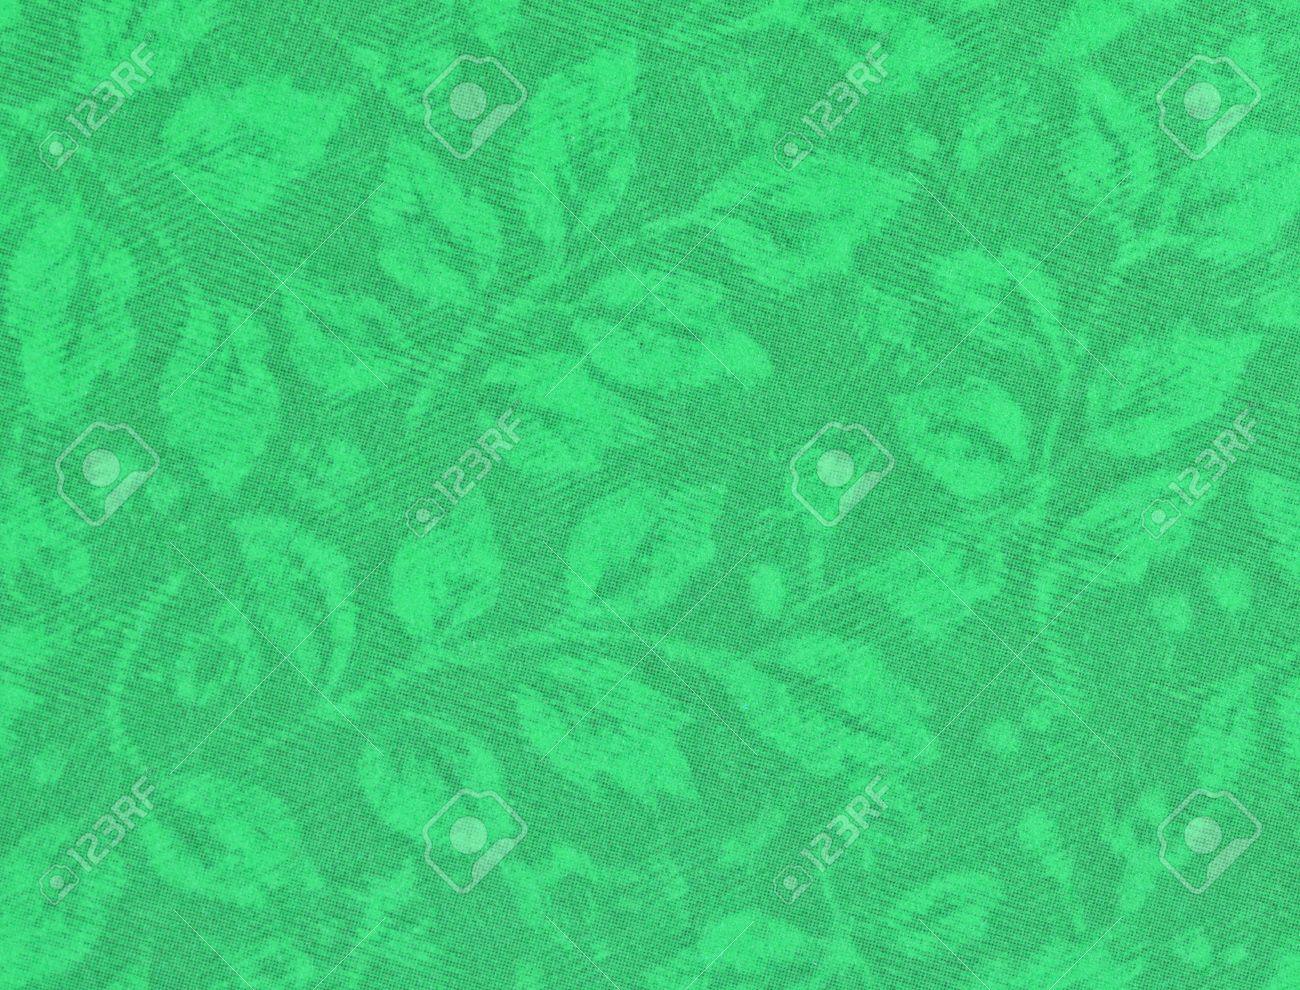 Green Emerald Wallpaper Background Stock Photo